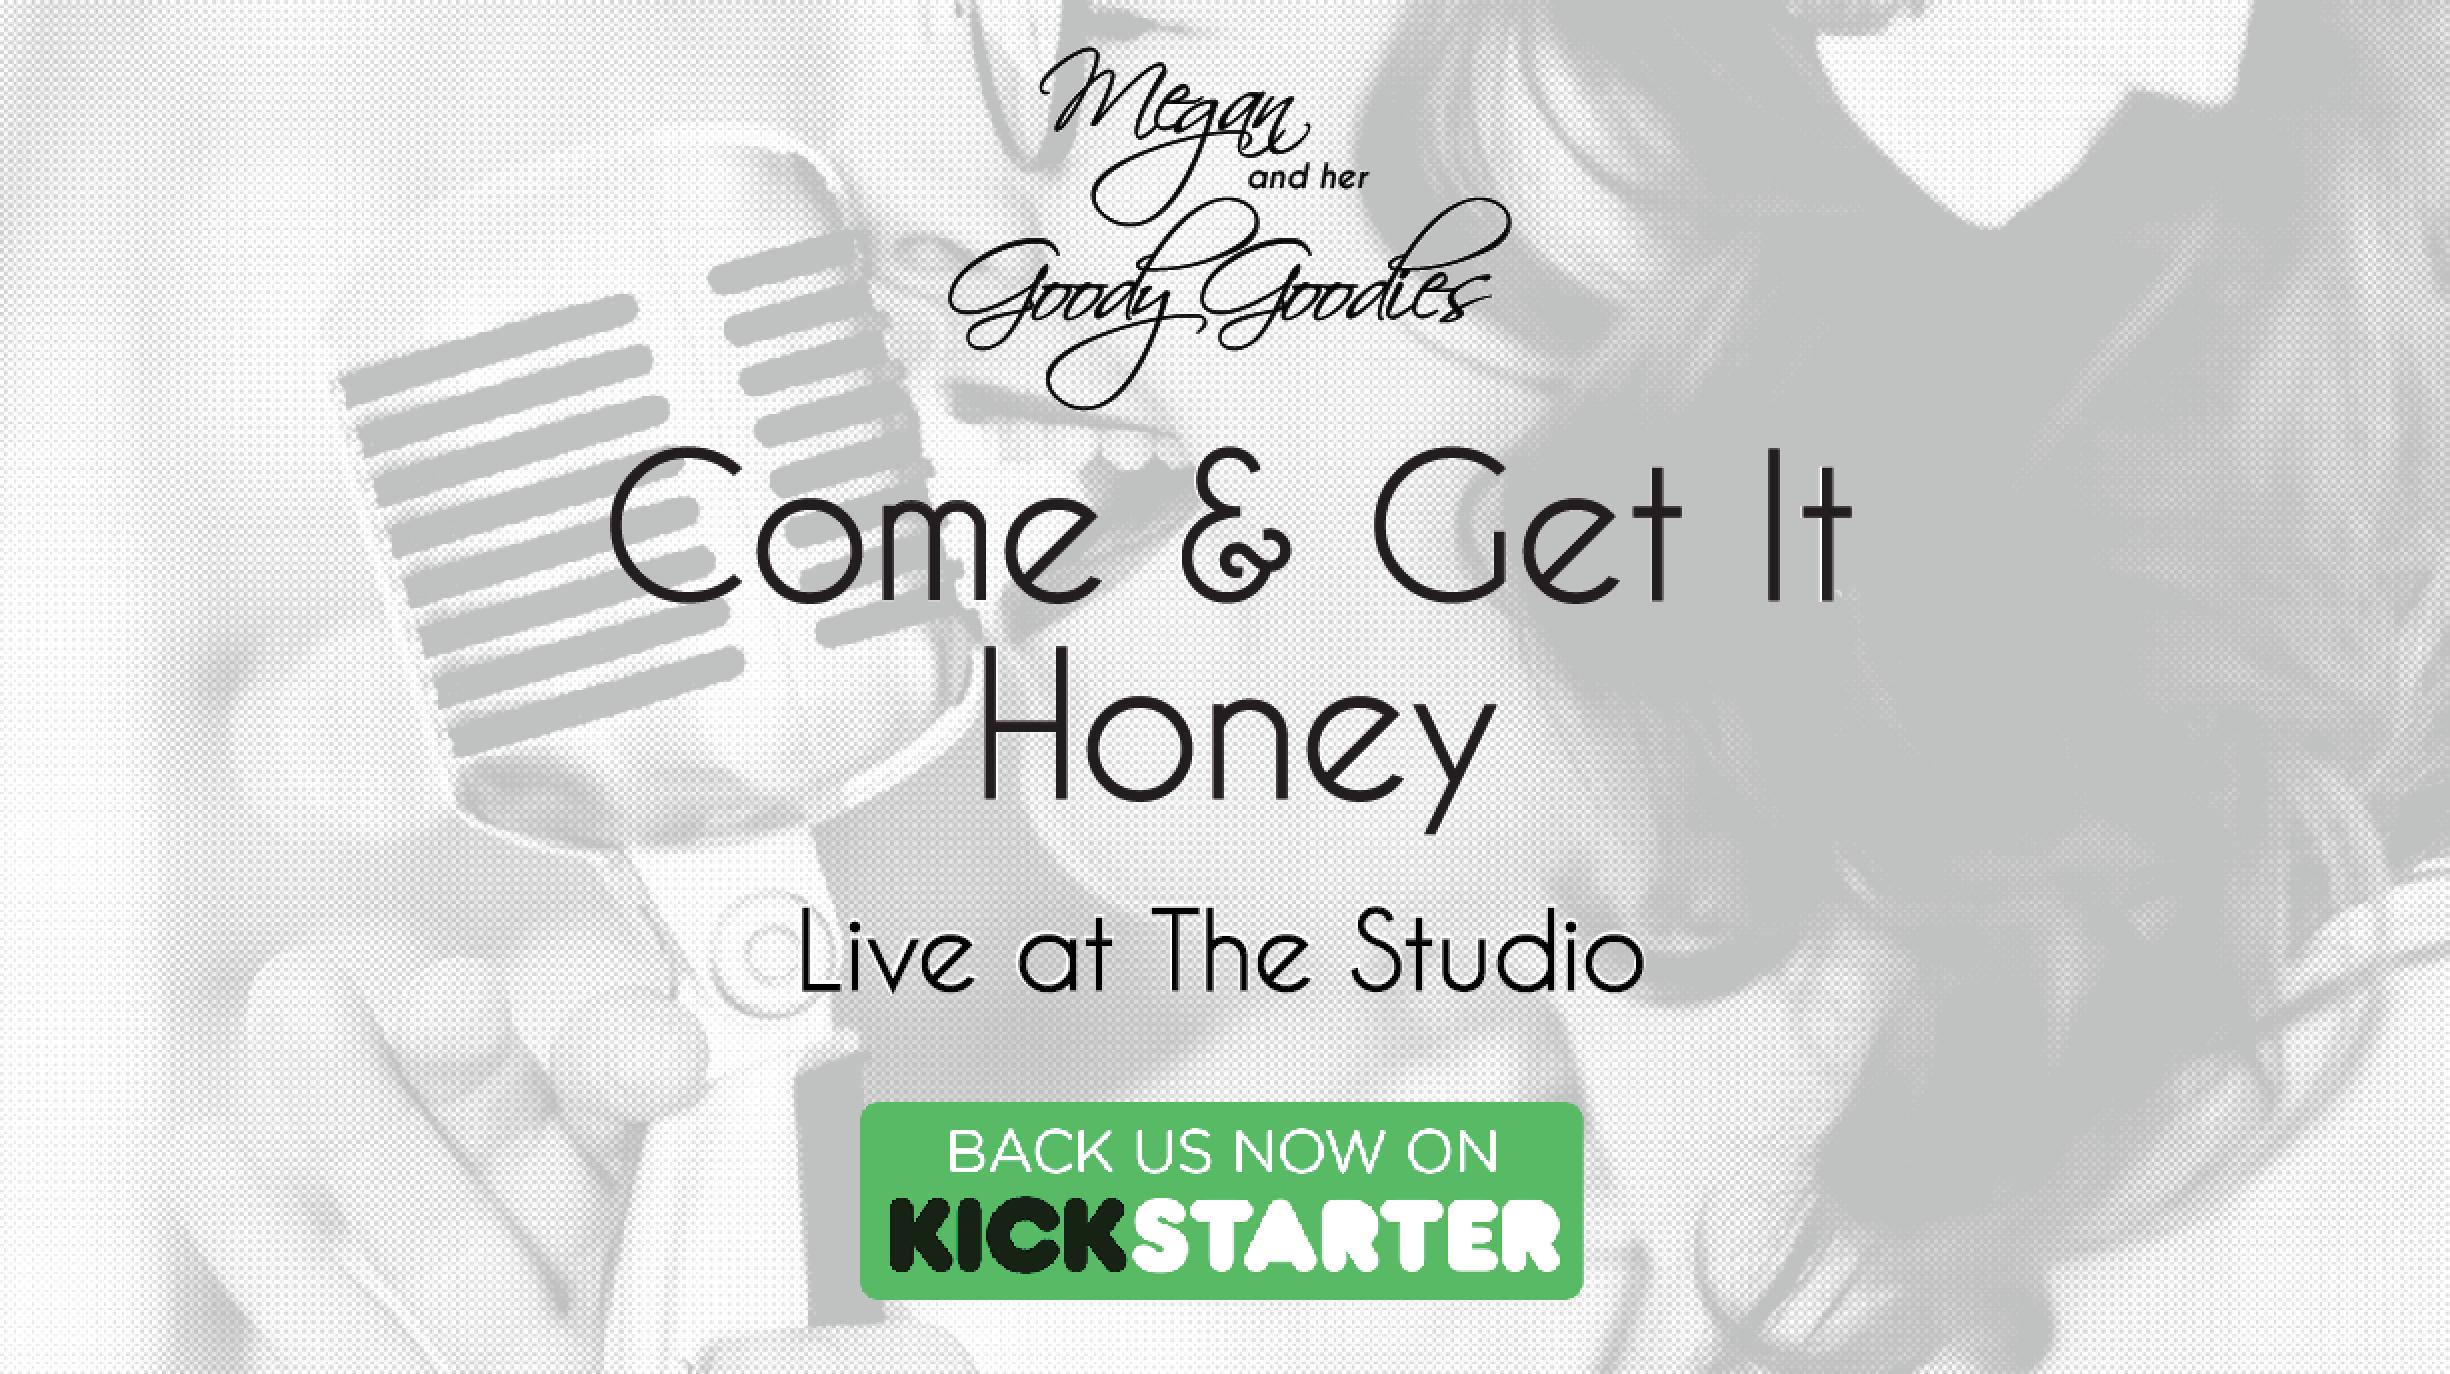 Come & Get It Honey